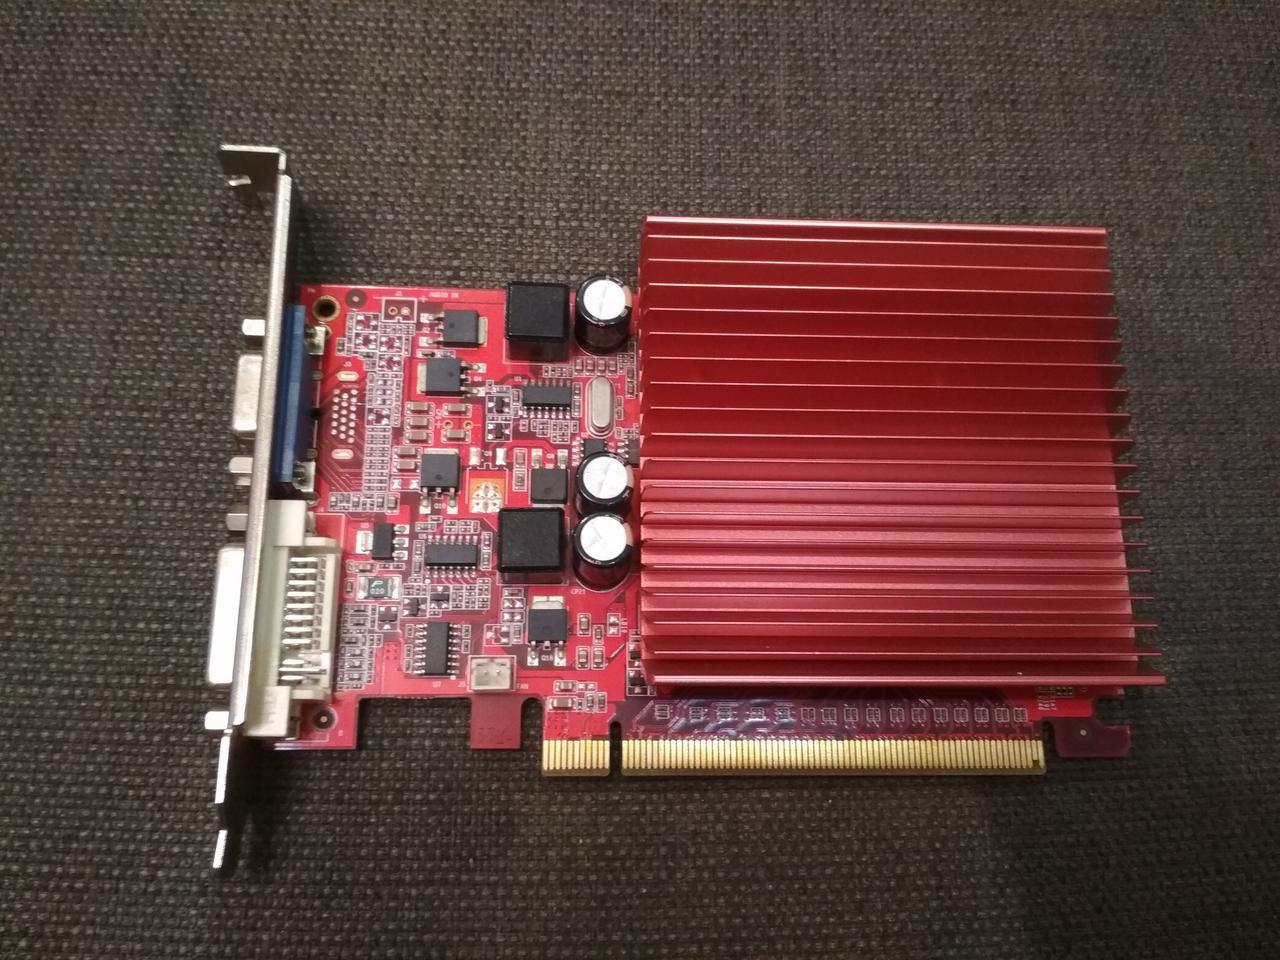 ВИДЕОКАРТА PCI-E Nvidia GeFORCE 9500 GT на 1GB и ПОЛНОЙ БИТНОСТЬЮ - 128 BIT с ГАРАНТИЕЙ ( видеоадаптер 9500GT)